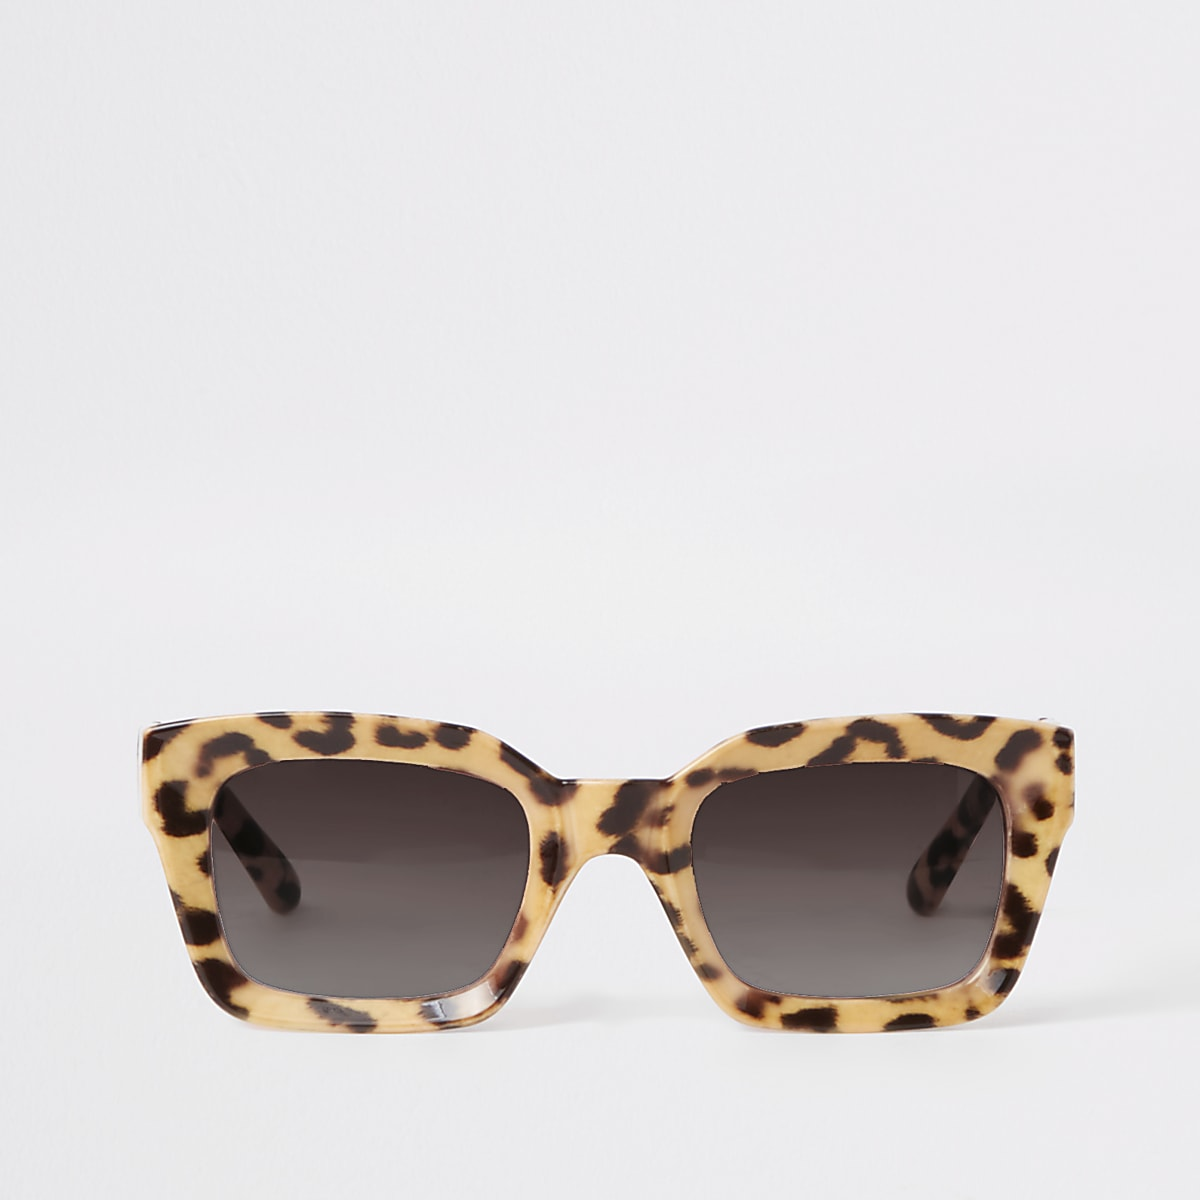 Brown leopard print glam sunglasses